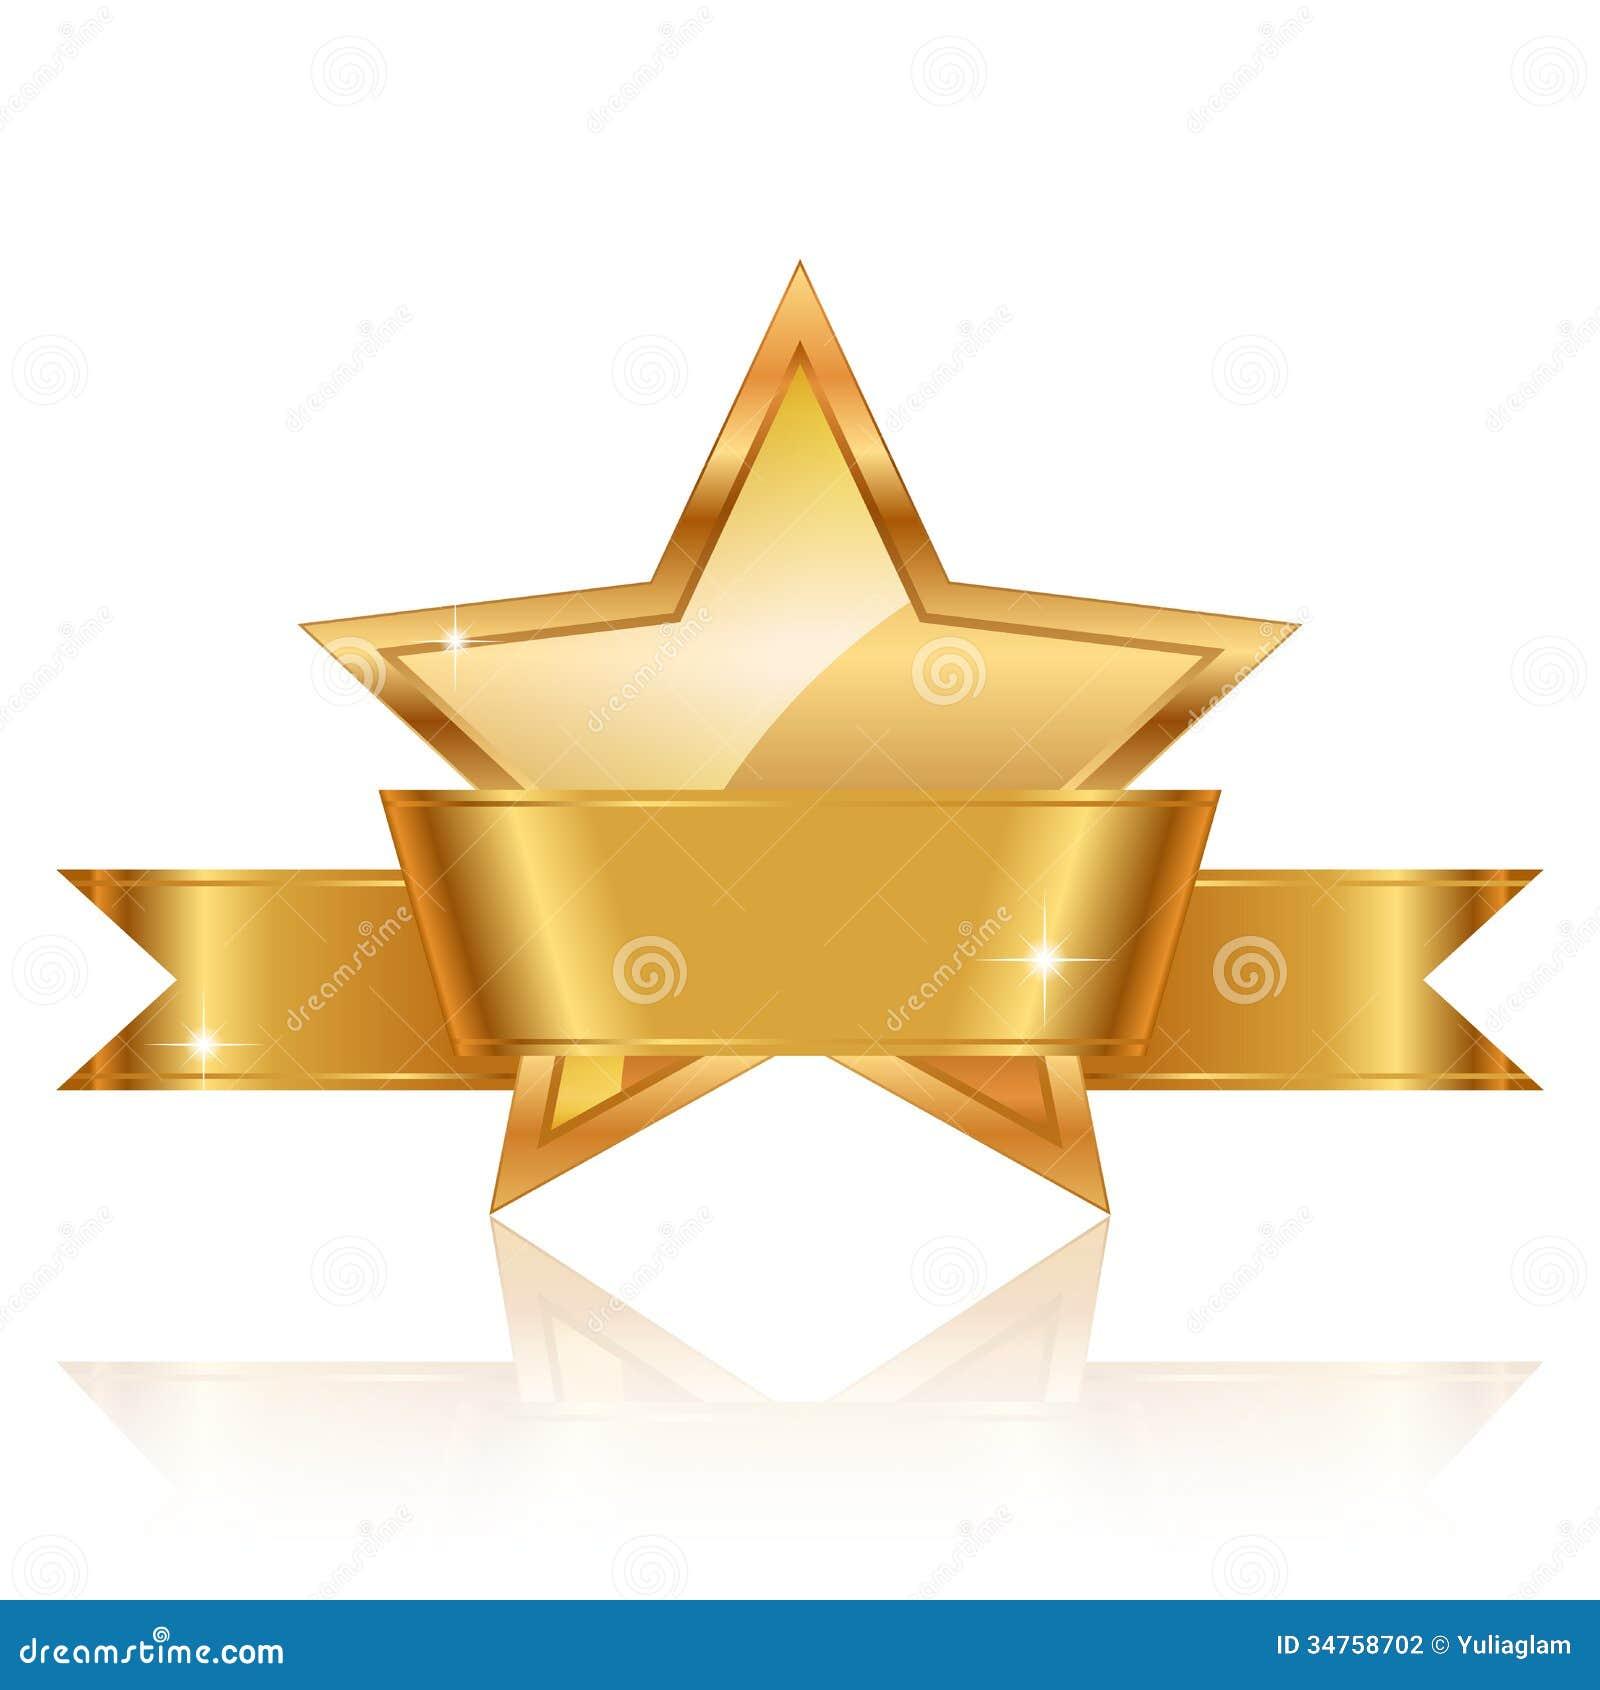 Pin Gold Award Ribbon Clip Art on Pinterest